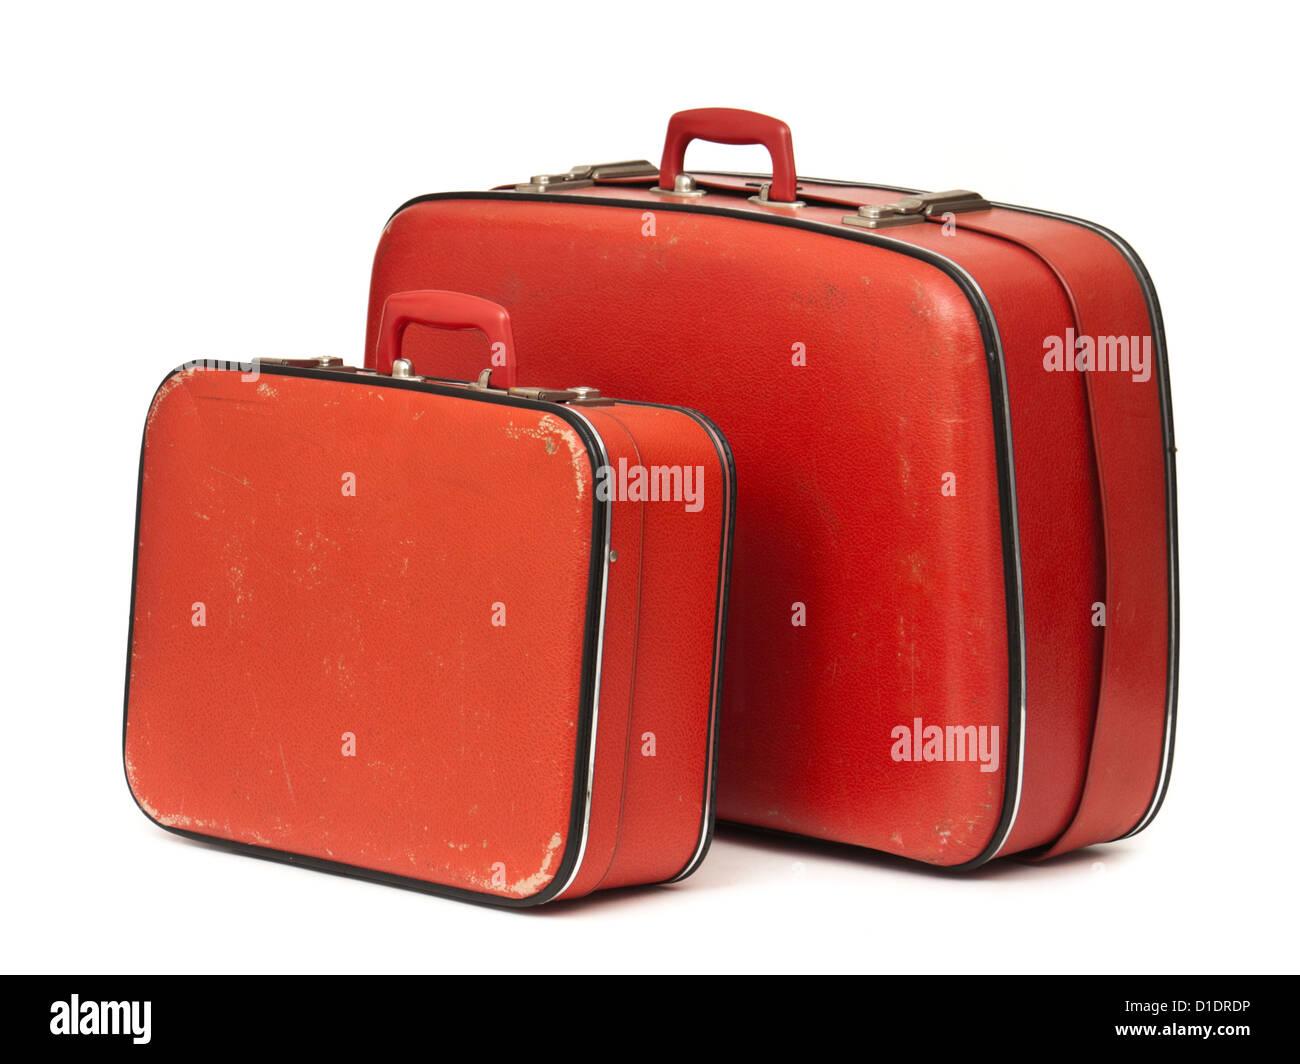 Pair of vintage 1950's 'Debroyal' suitcases by Debenhams (UK retailer) - Stock Image